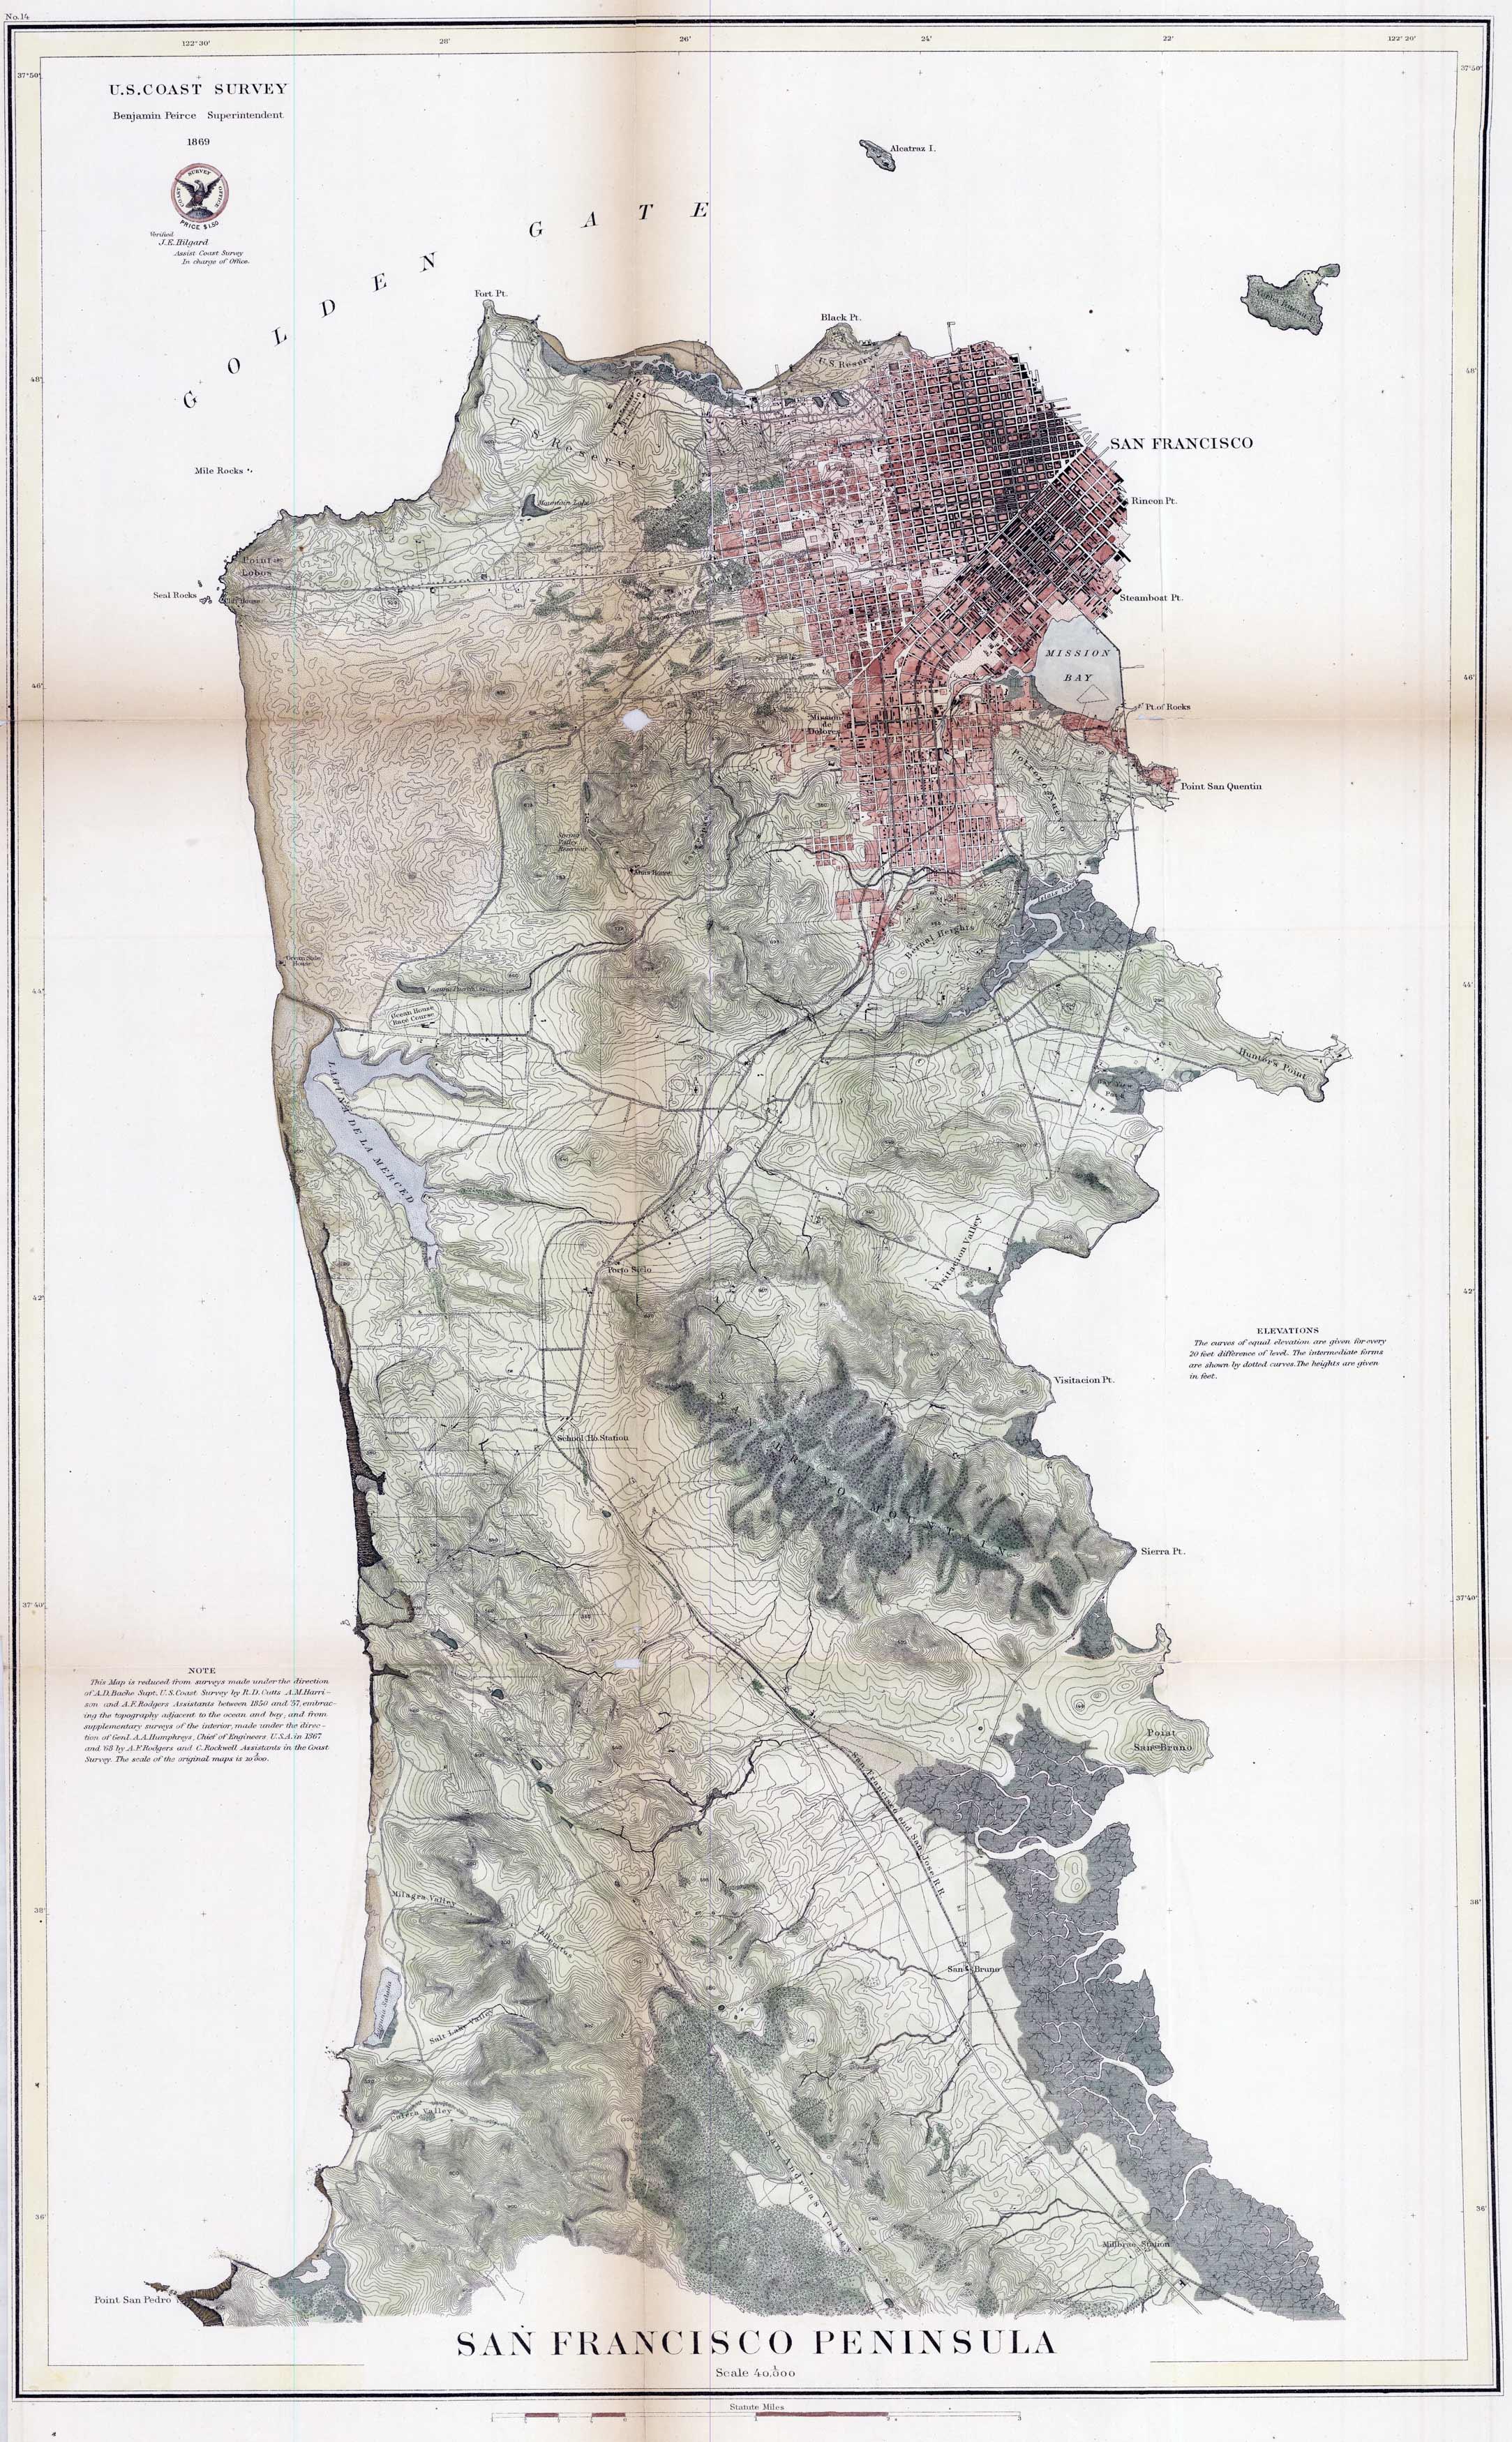 U.S. Coast Survey of San Francisco Peninsula